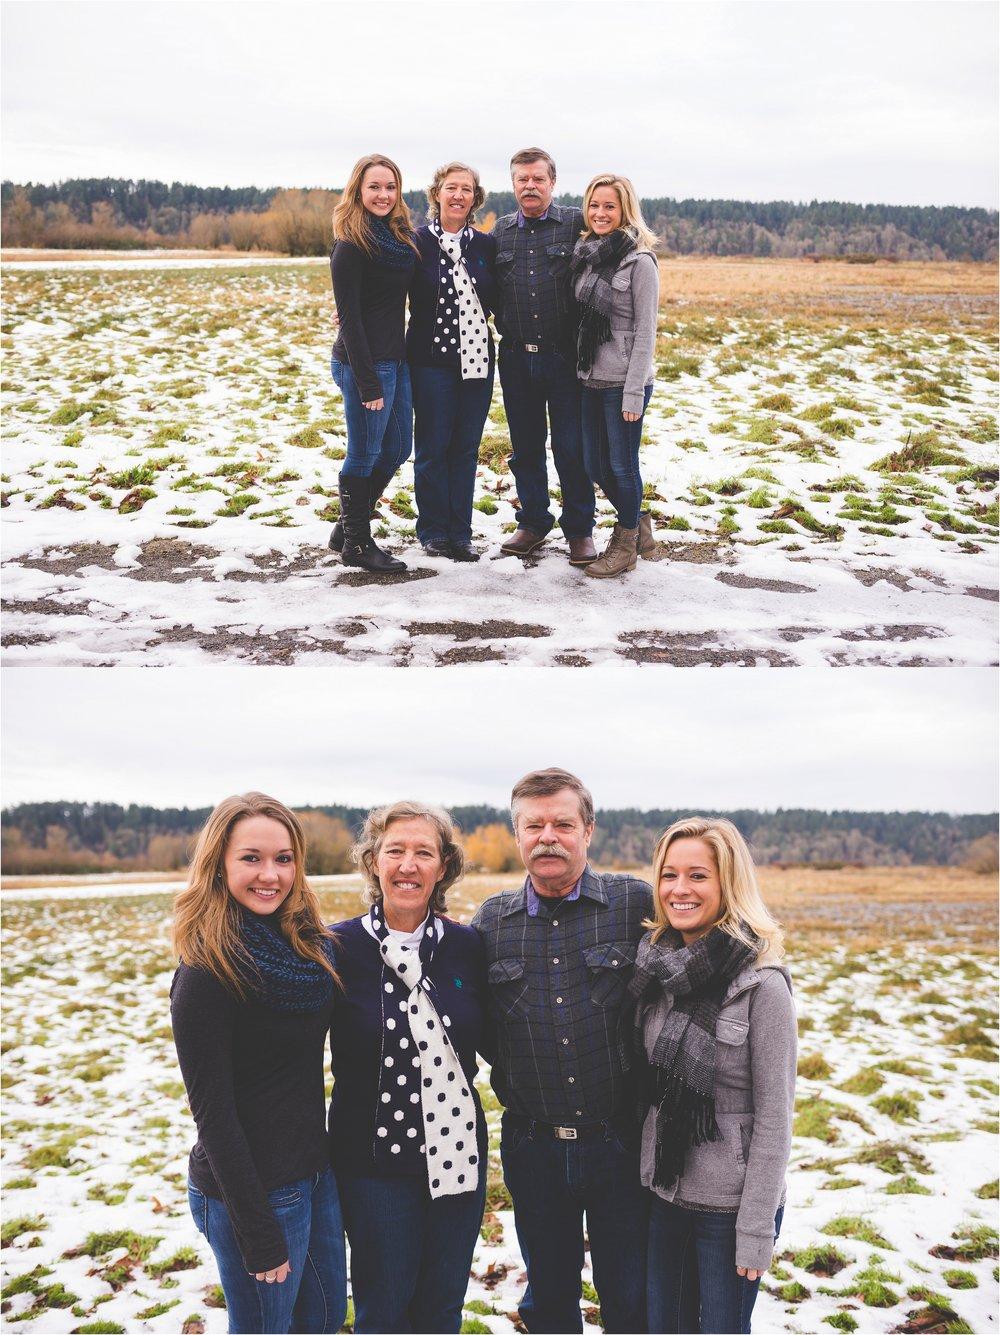 family-session-at-nisqually-national-wildlife-refuge-jannicka-mayte-olympia-wa-family-photographer_0001.jpg